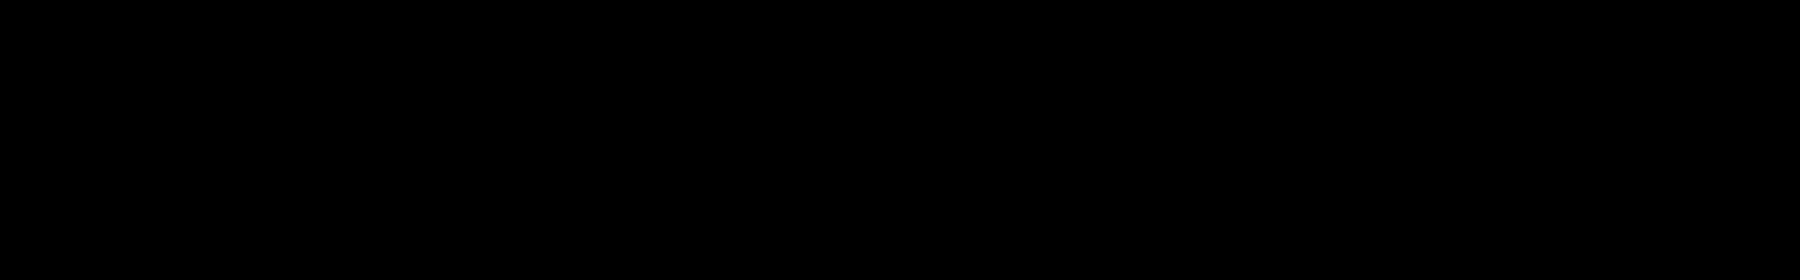 Poison Trap audio waveform